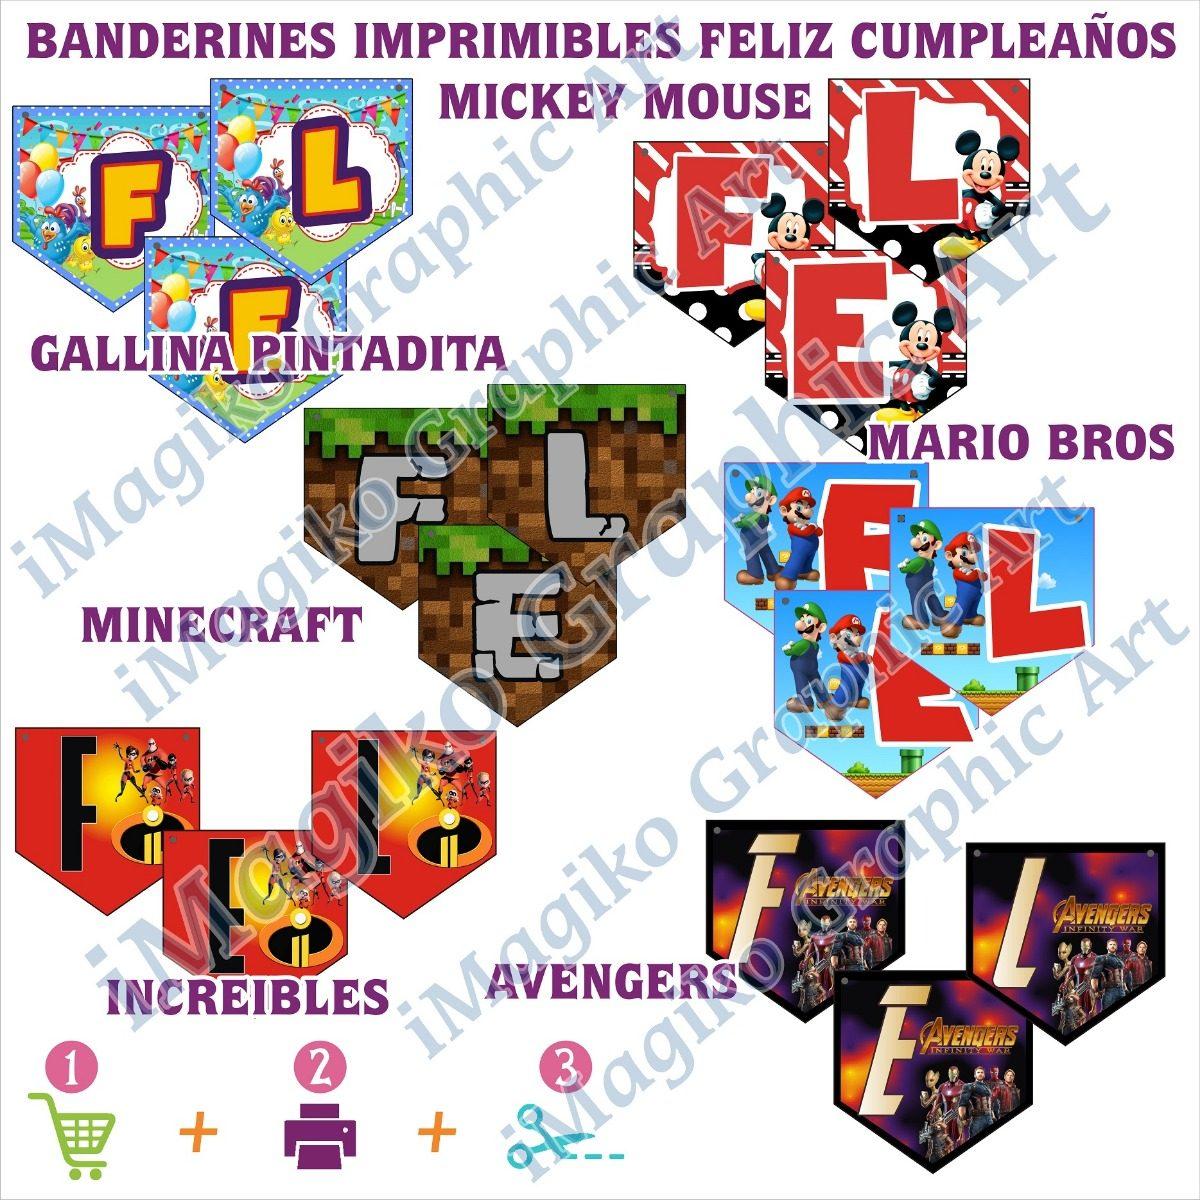 Banner De Banderines Imprimible Feliz Cumpleanos Personajes